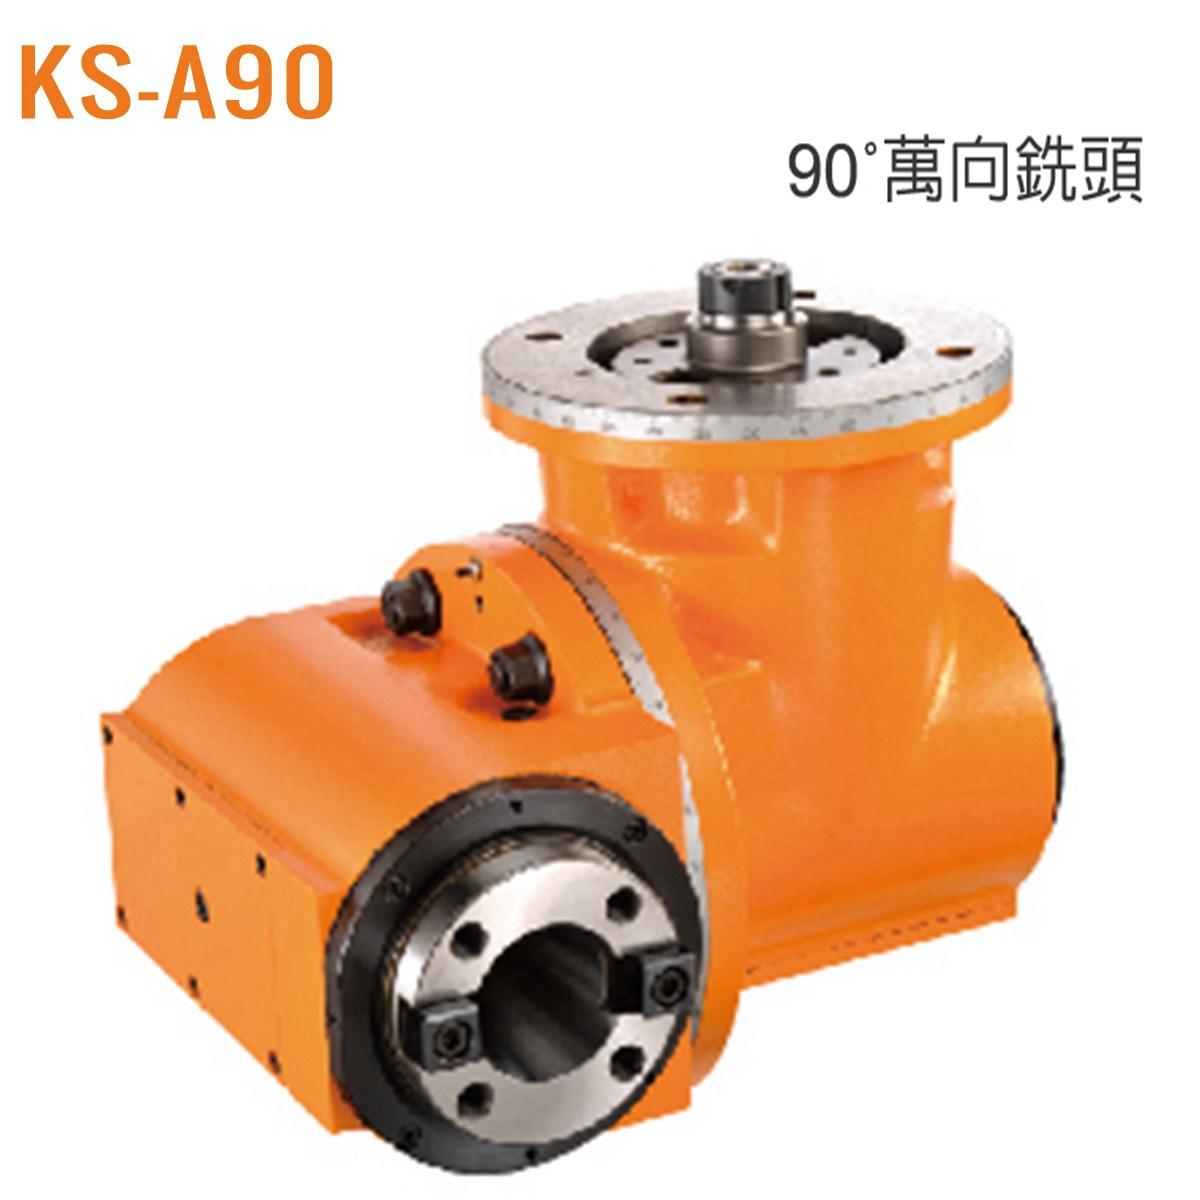 KS-A90图1